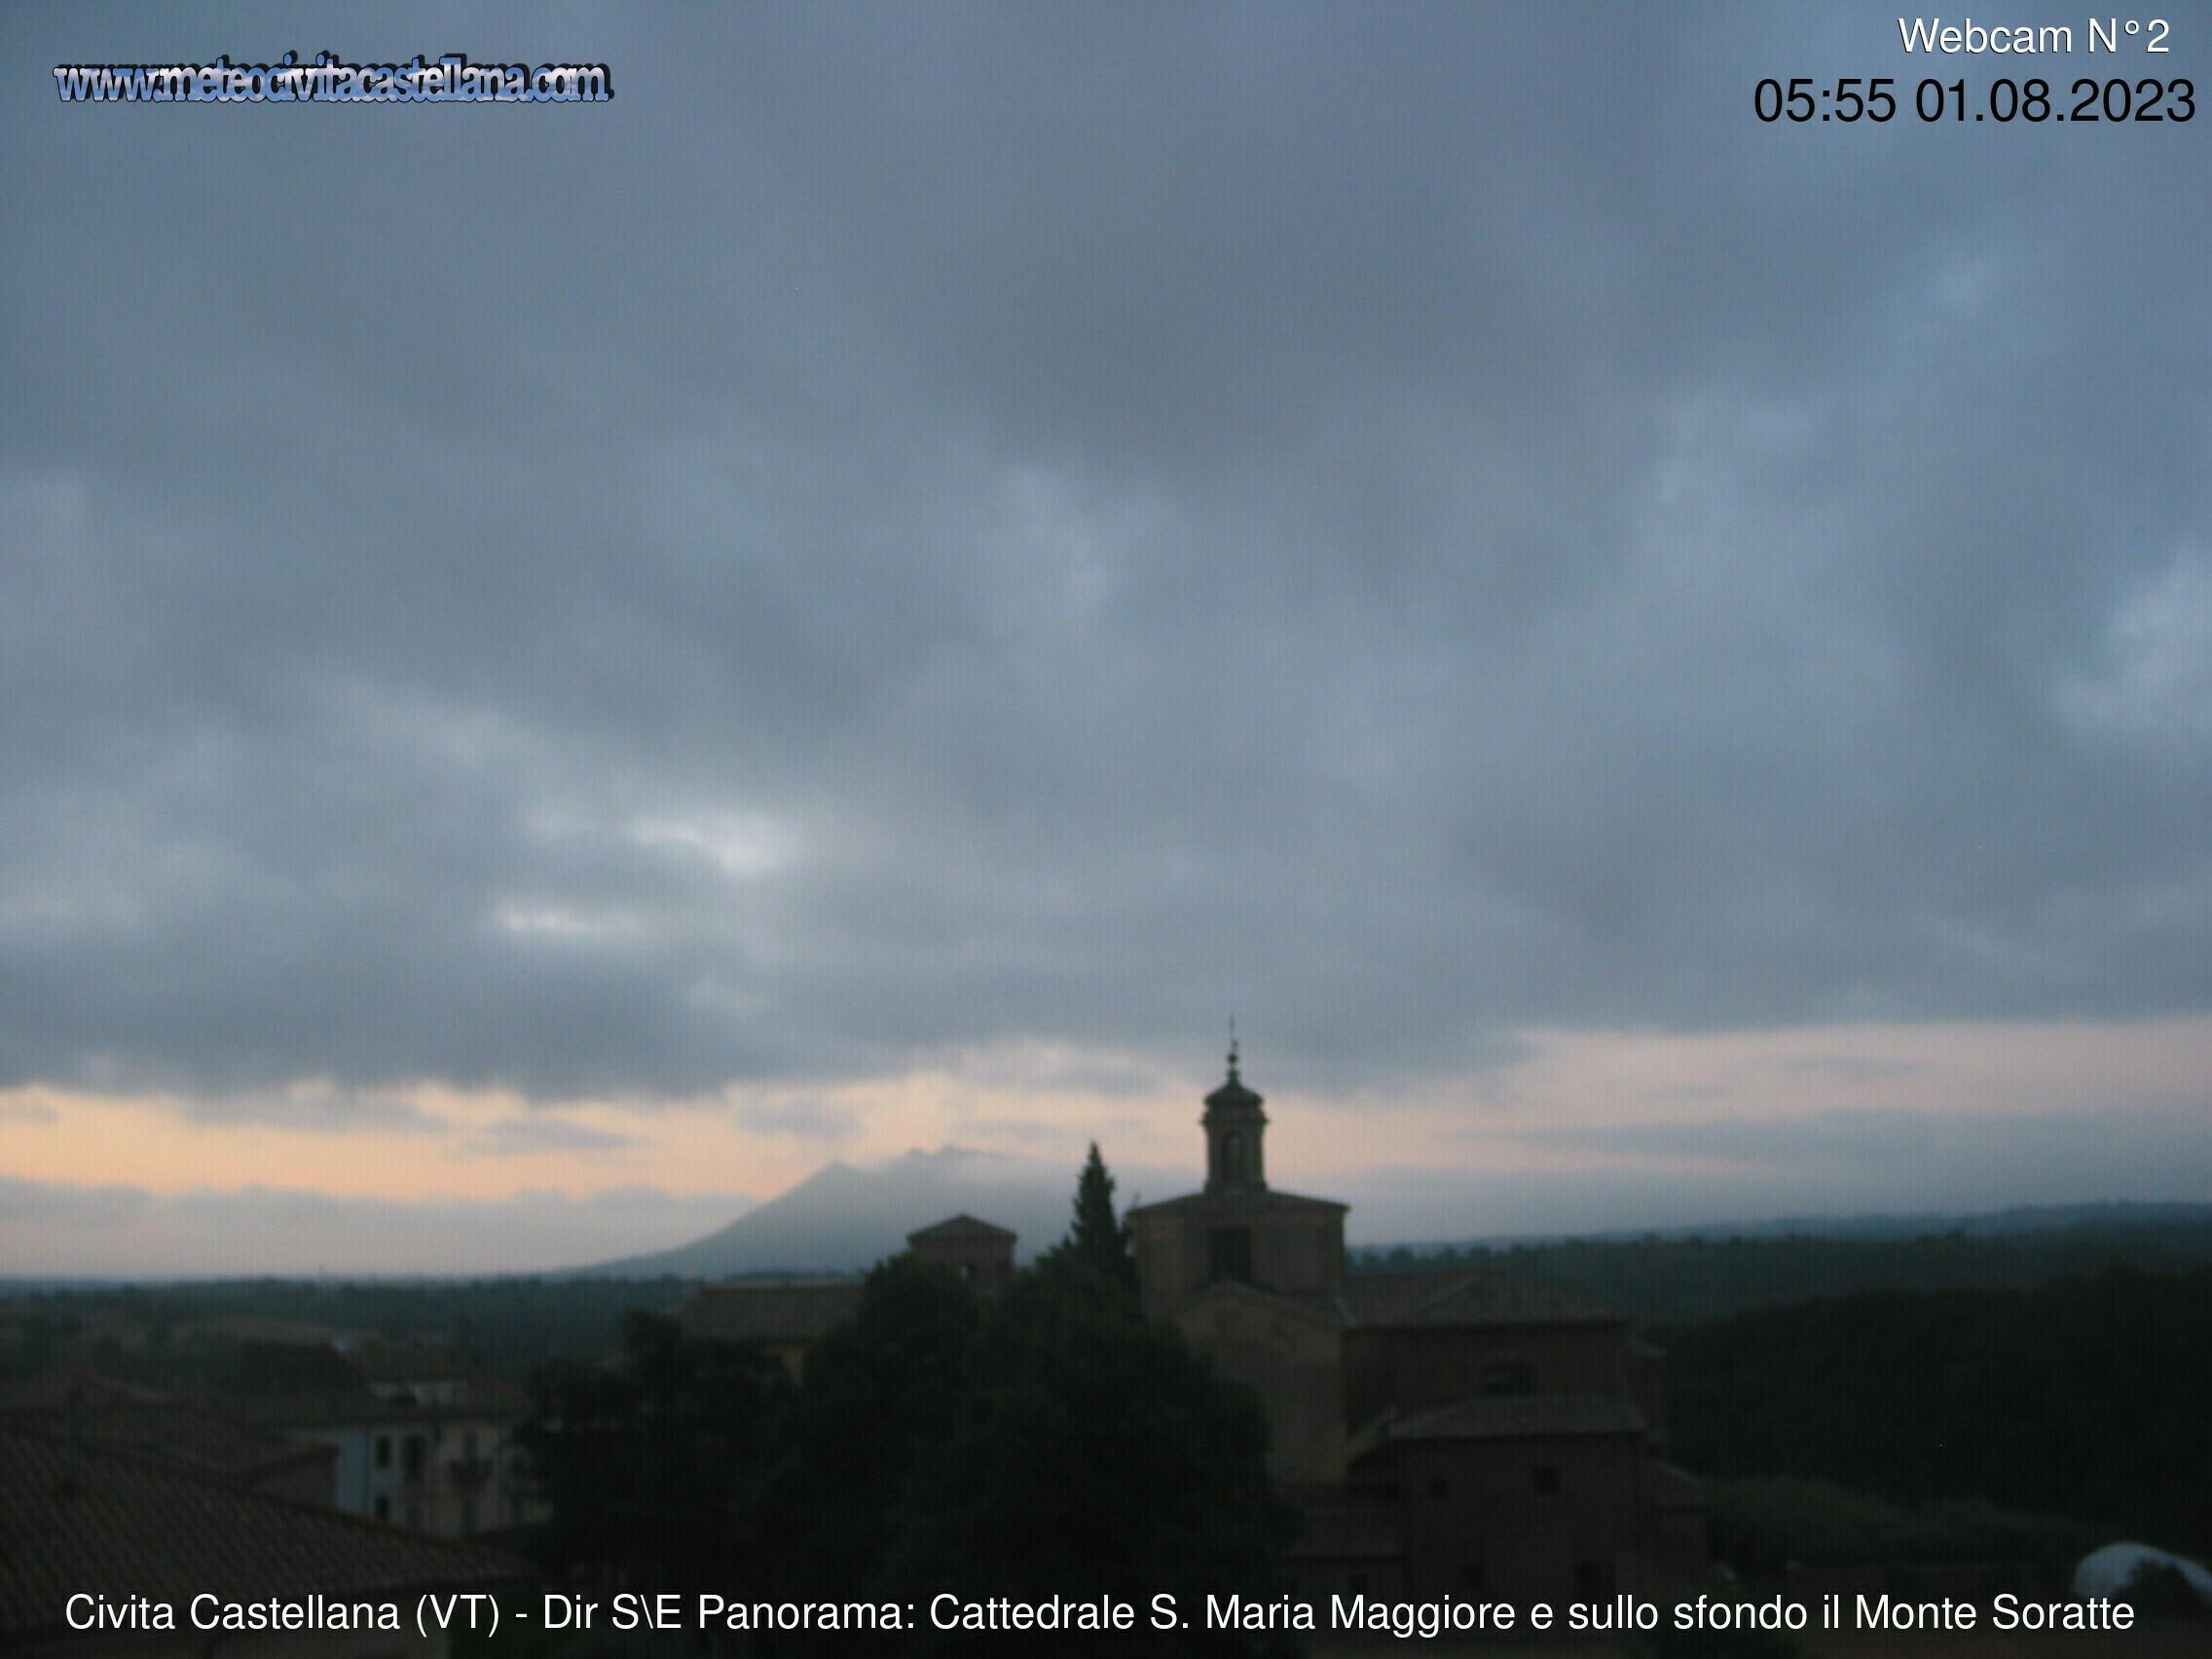 Civita Castellana Fri. 05:58